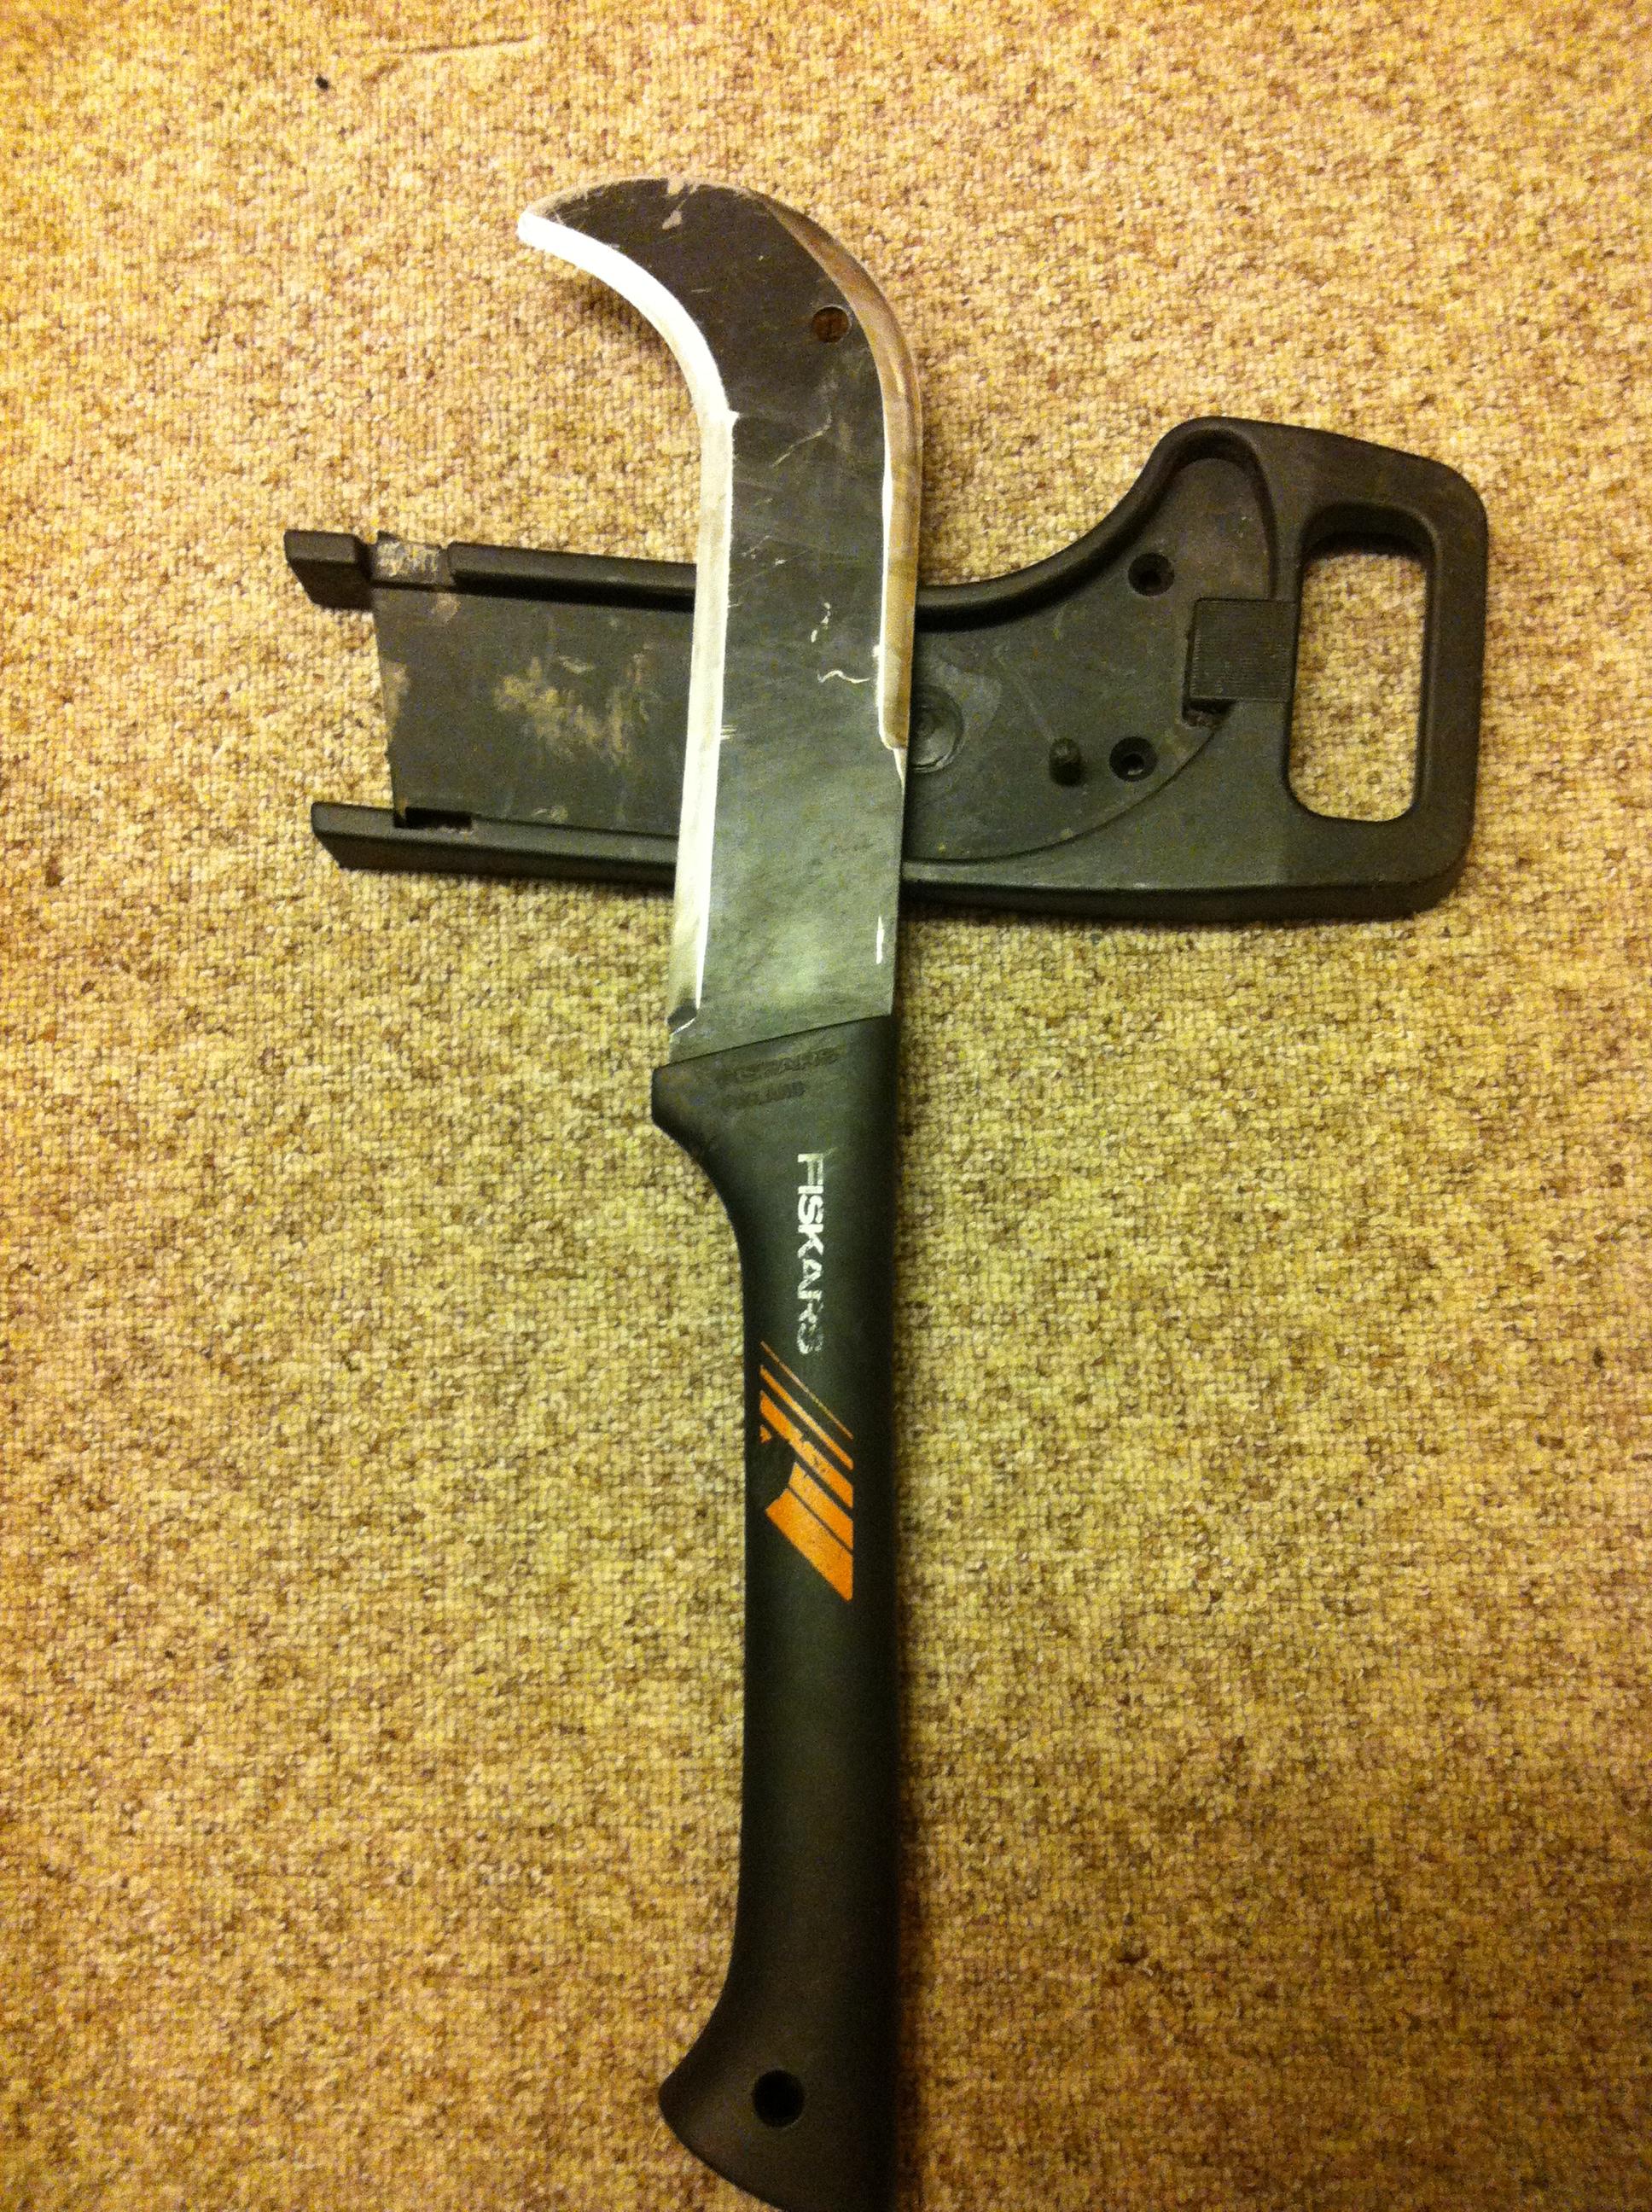 Convert a Fiskars brush knive into a survival tool/platform